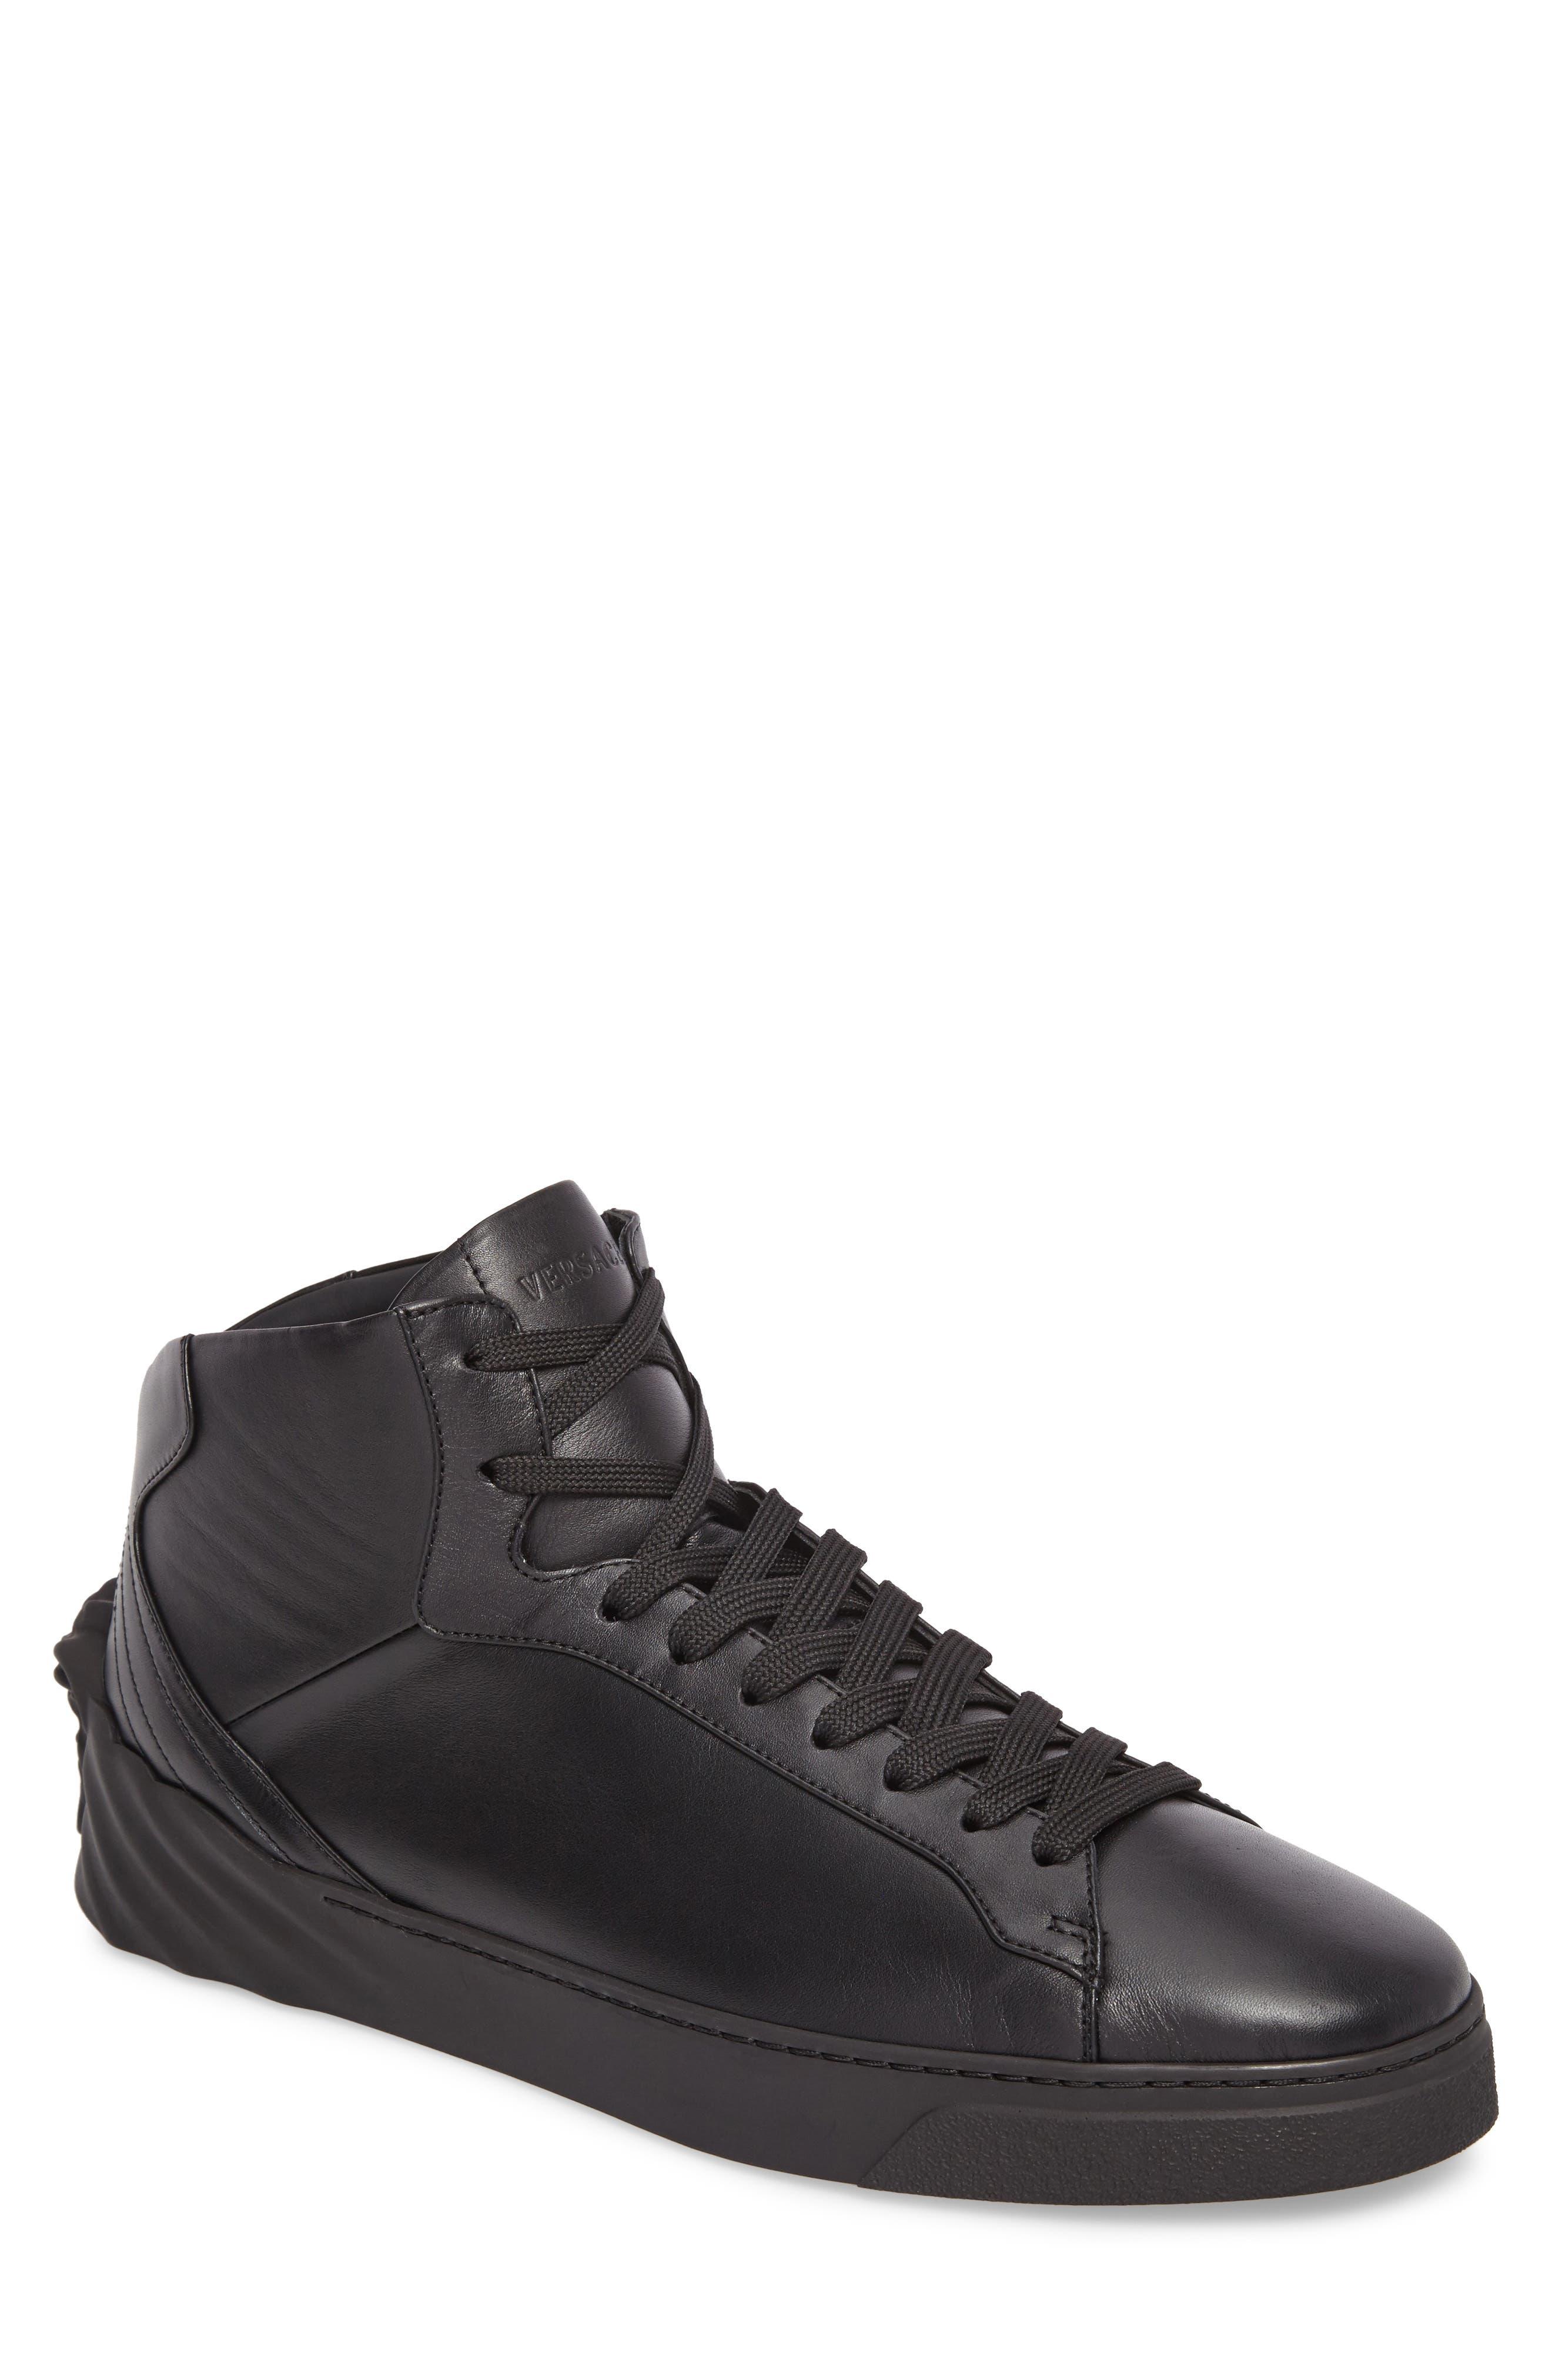 3D Medusa Sneaker,                             Main thumbnail 1, color,                             Black